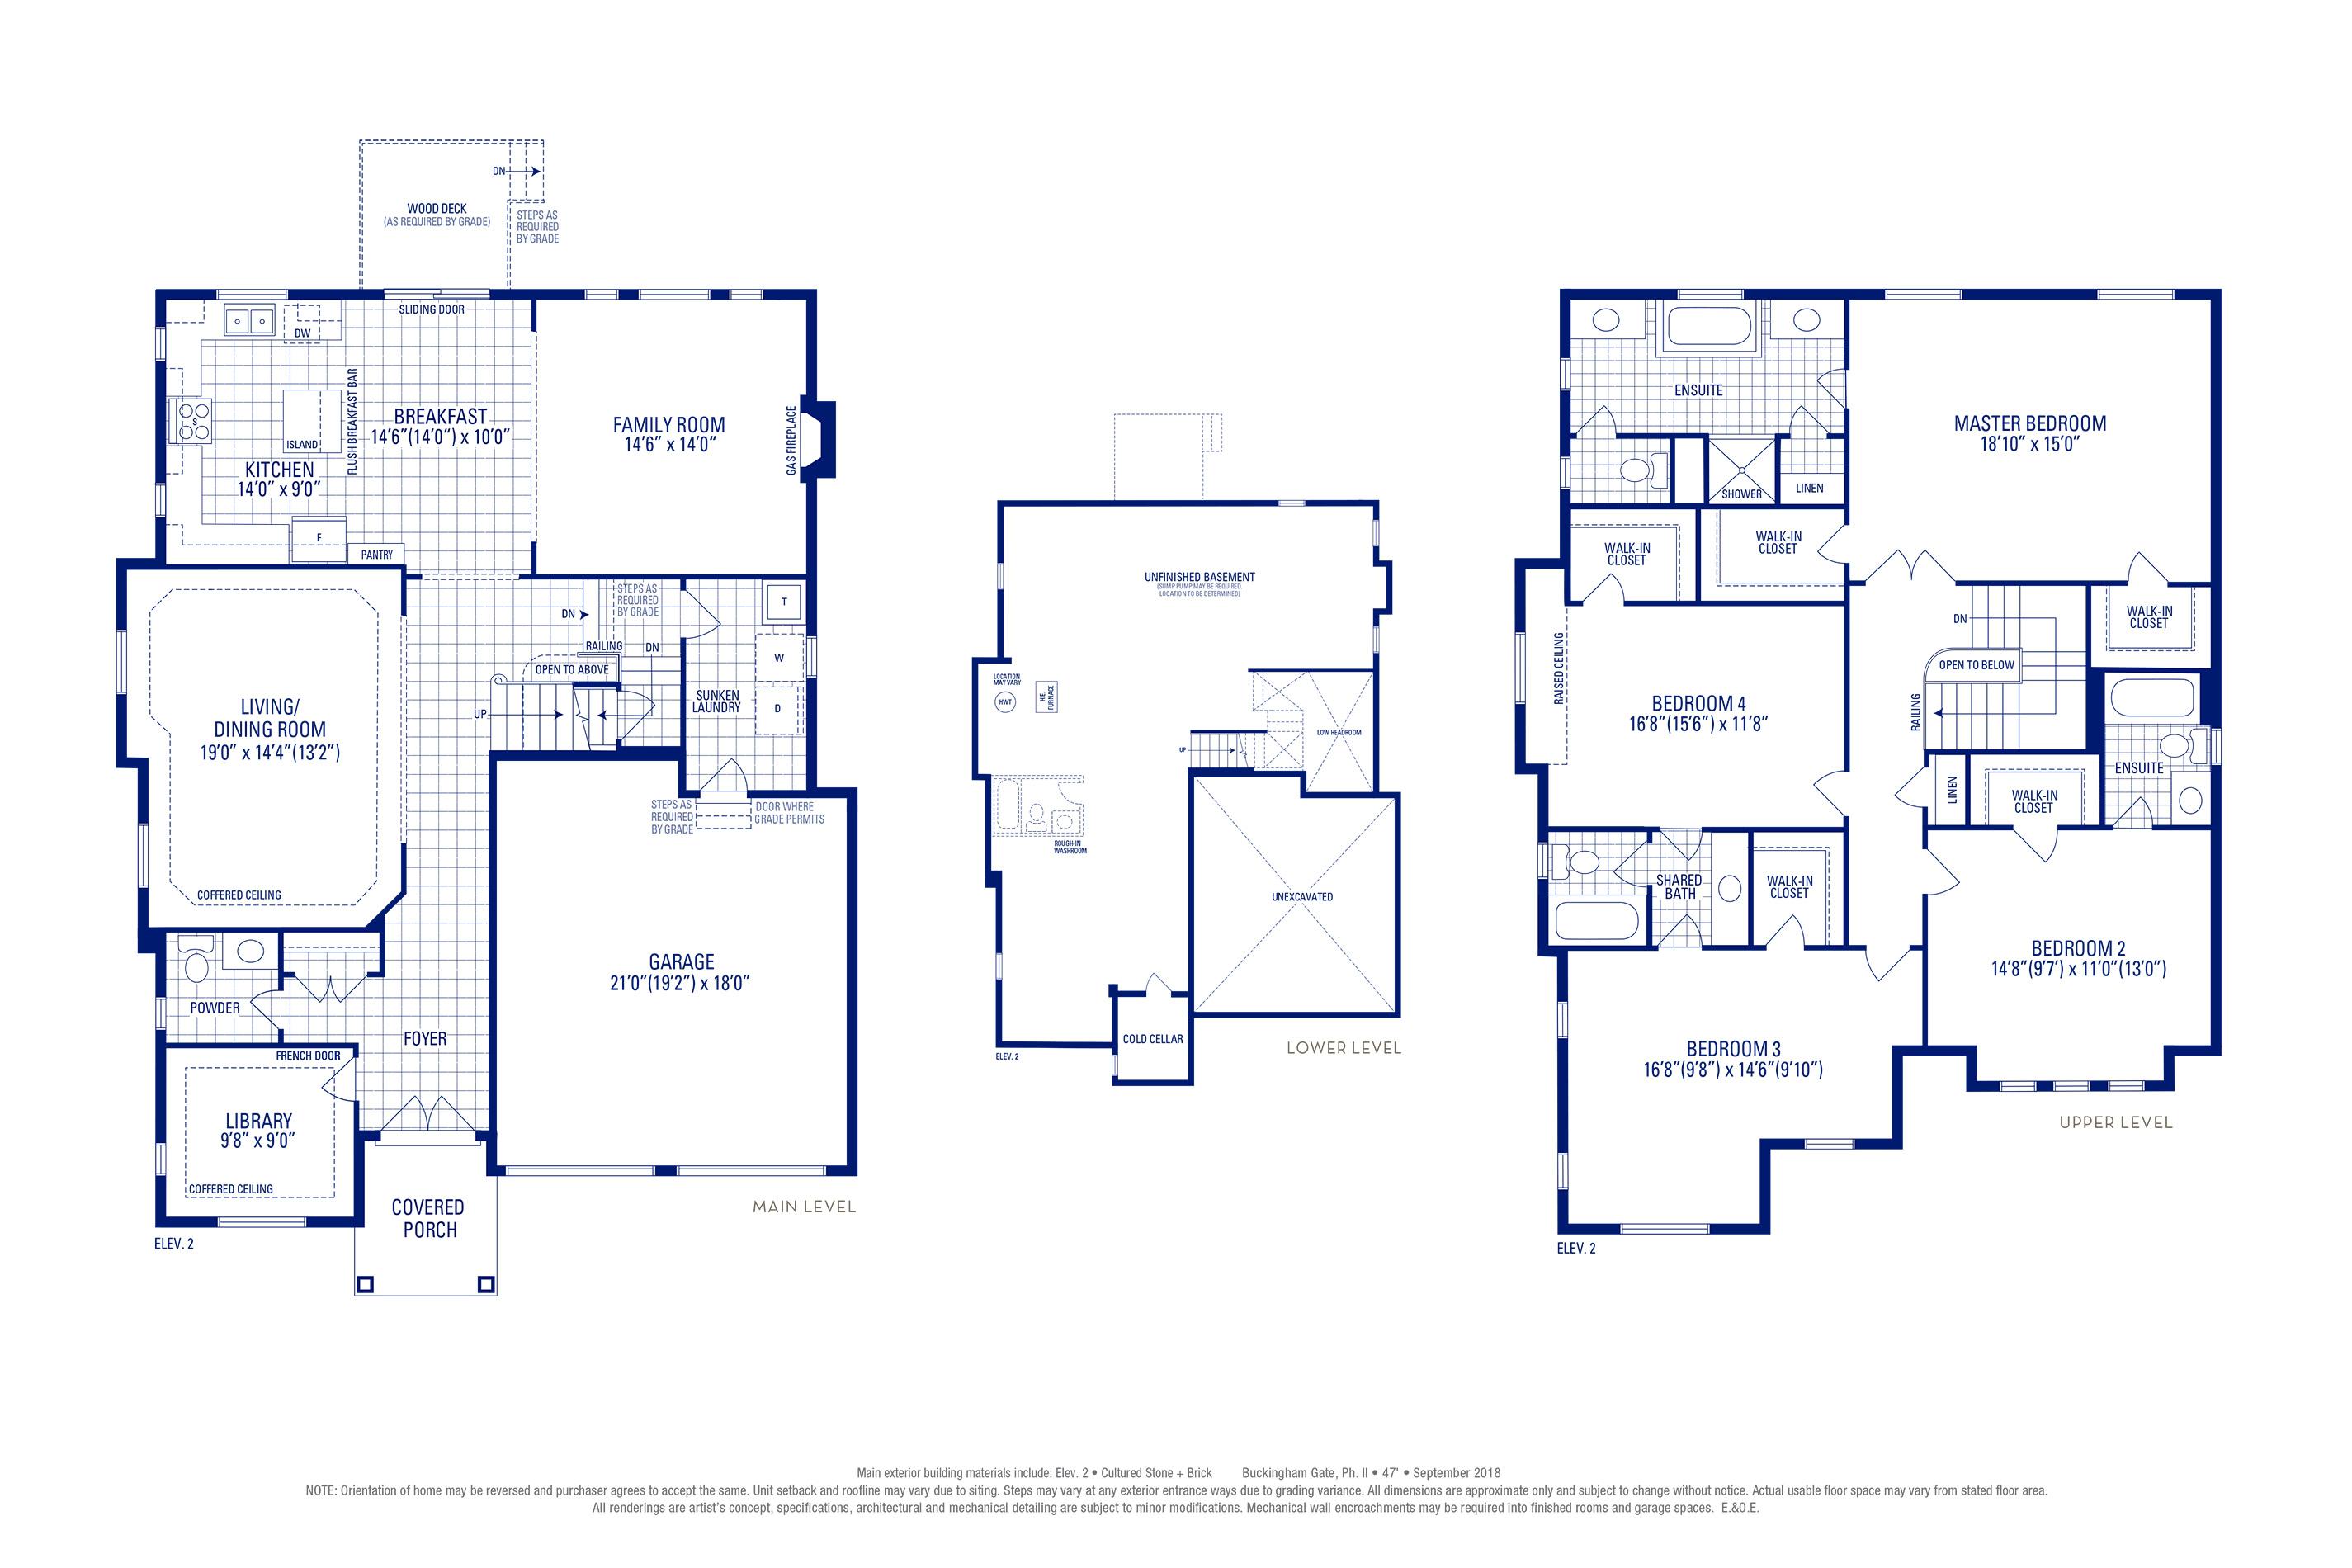 Stafford 12 Elev. 2 Floorplan Thumbnail